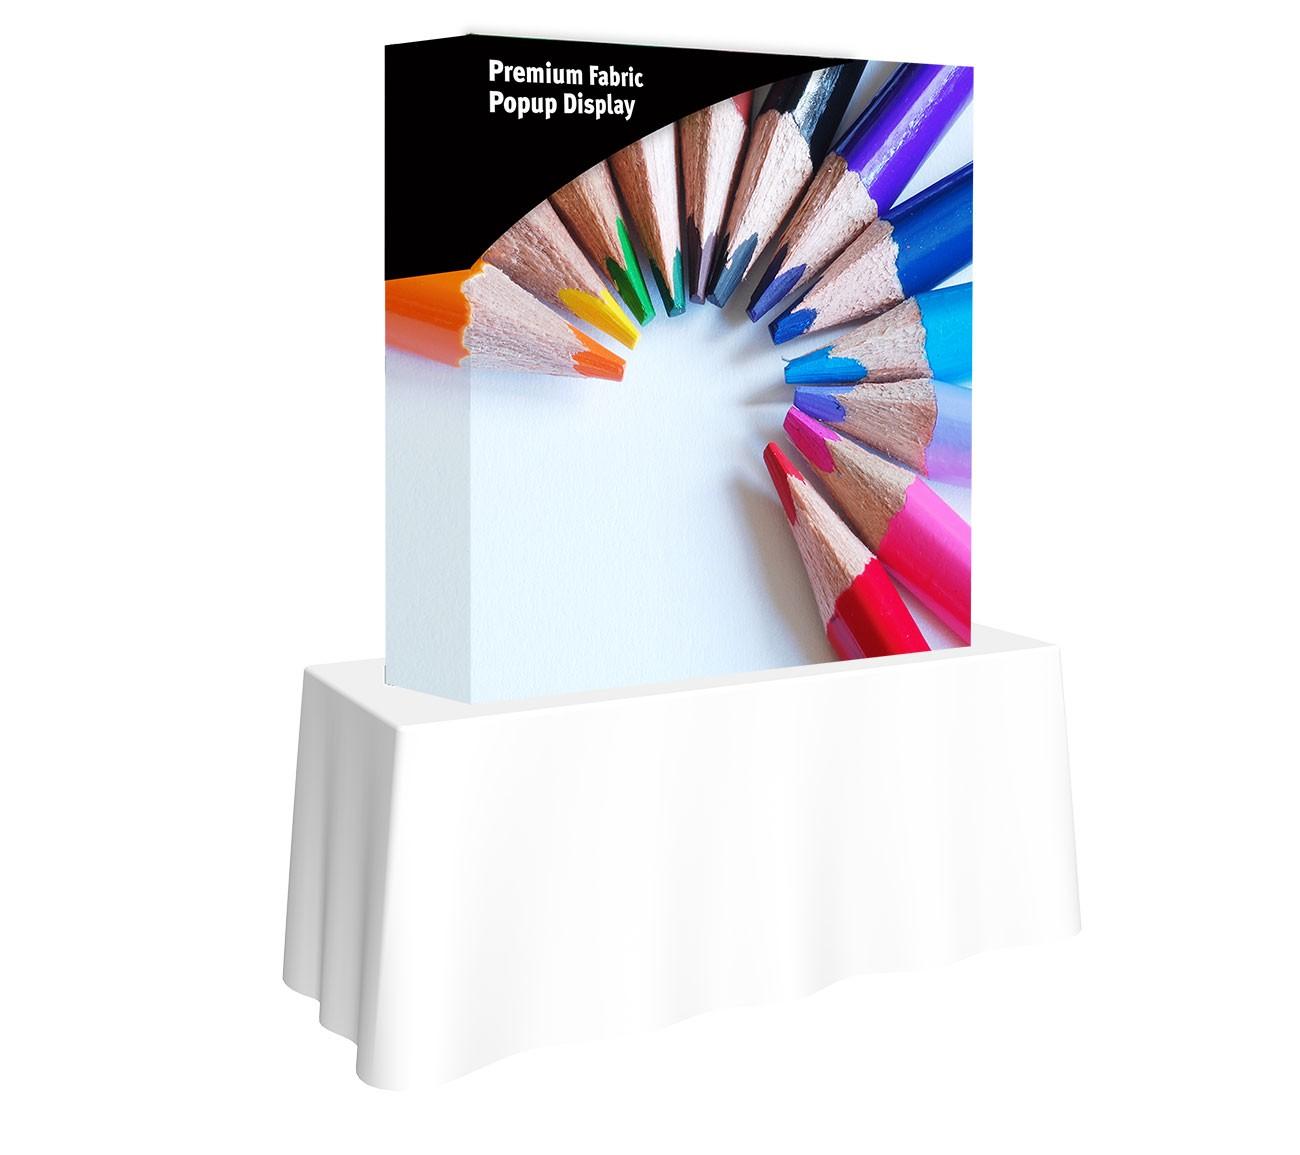 Premium Fabric Popup 5' x 5' Table Top Display